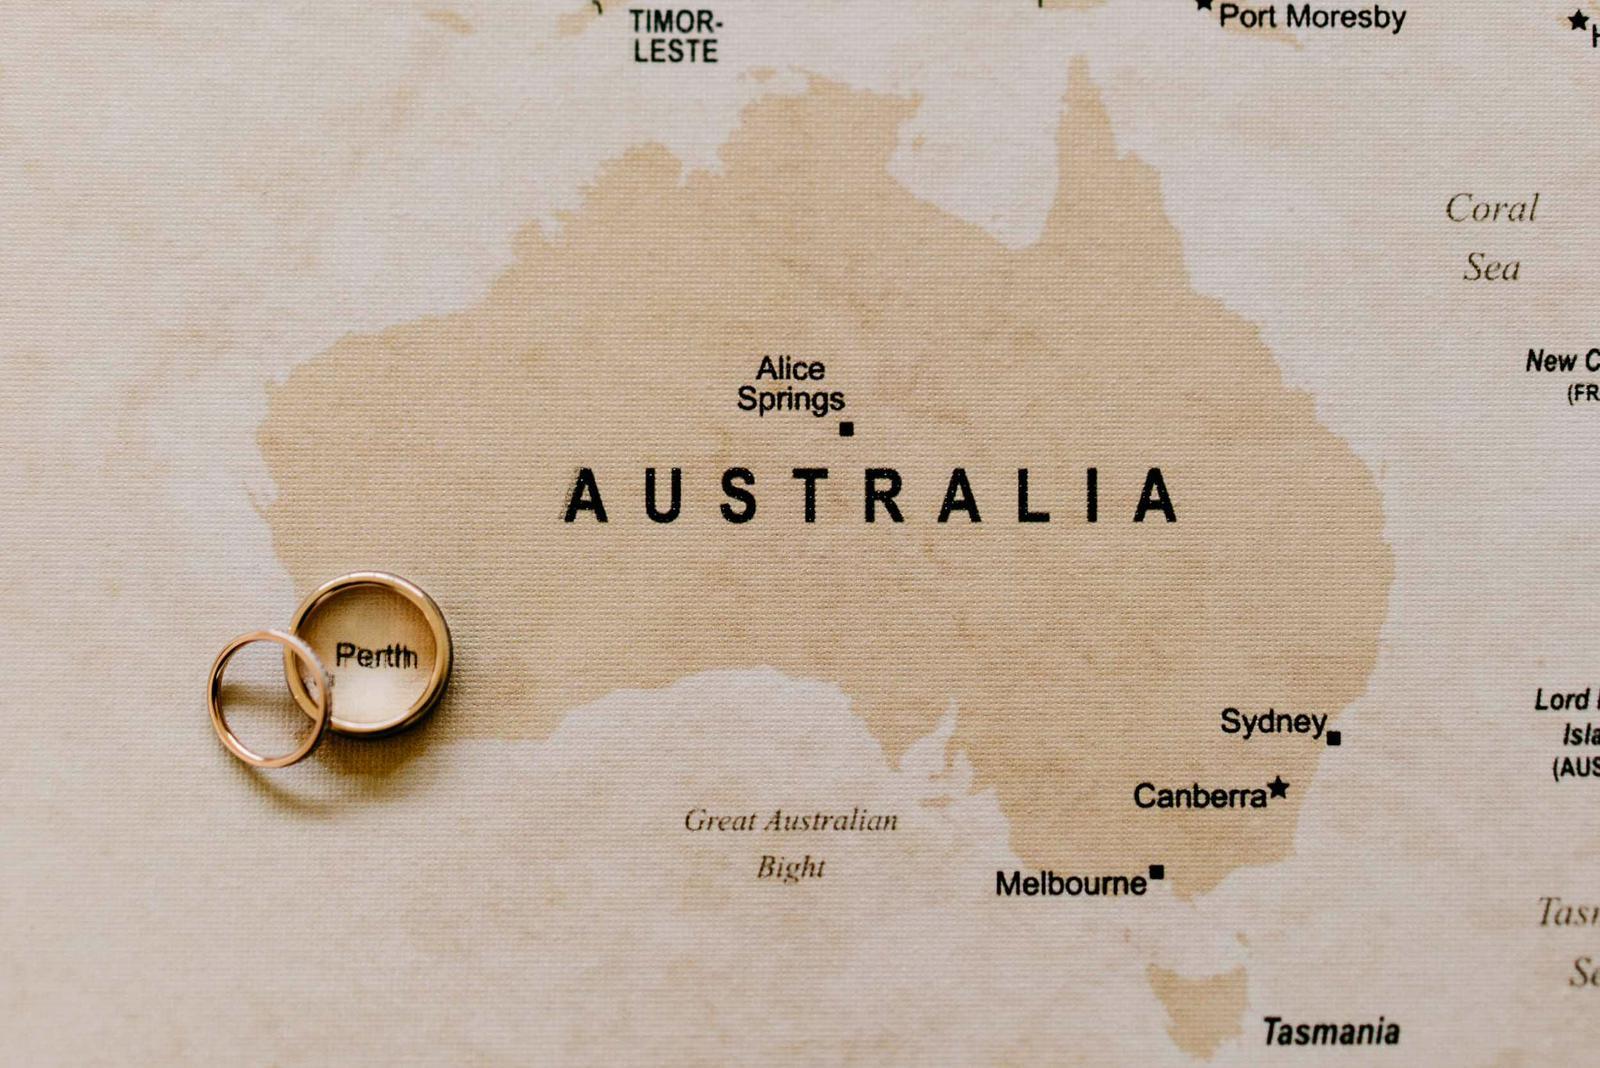 https://www.lovebirdceremonies.com.au/wp-content/uploads/2020/07/Photo-above-Weddings-for-Overseas-Visitors-Getting-Married-in-Australia.jpg